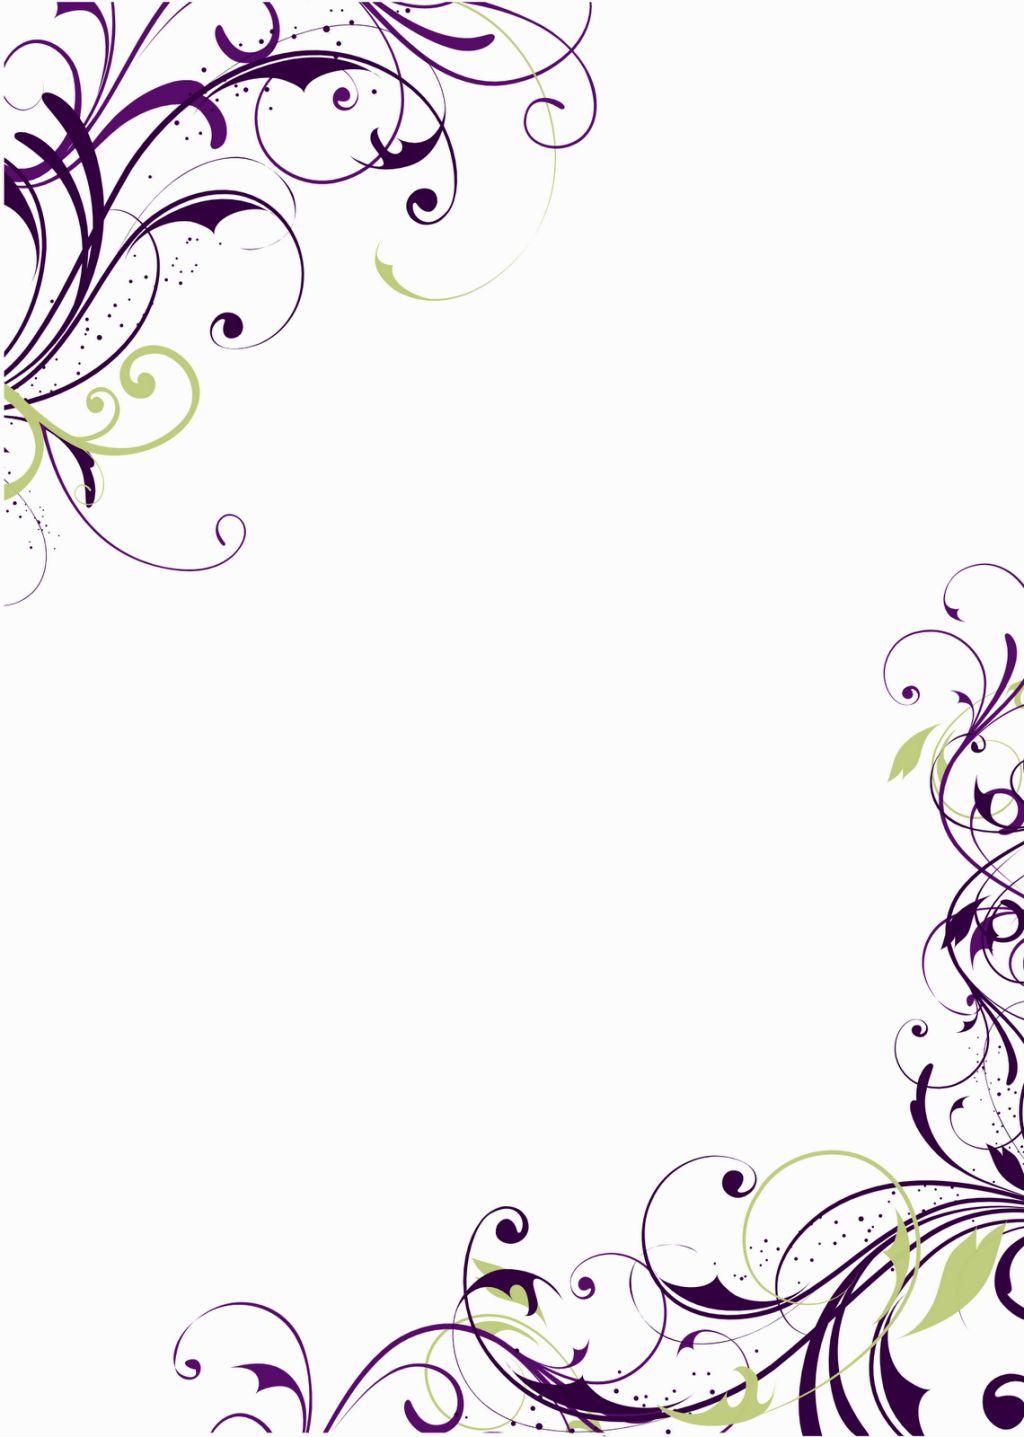 Free Wedding Invitation Templates For Word | Marina Gallery Fine Art - Free Printable Wedding Invitation Templates For Microsoft Word